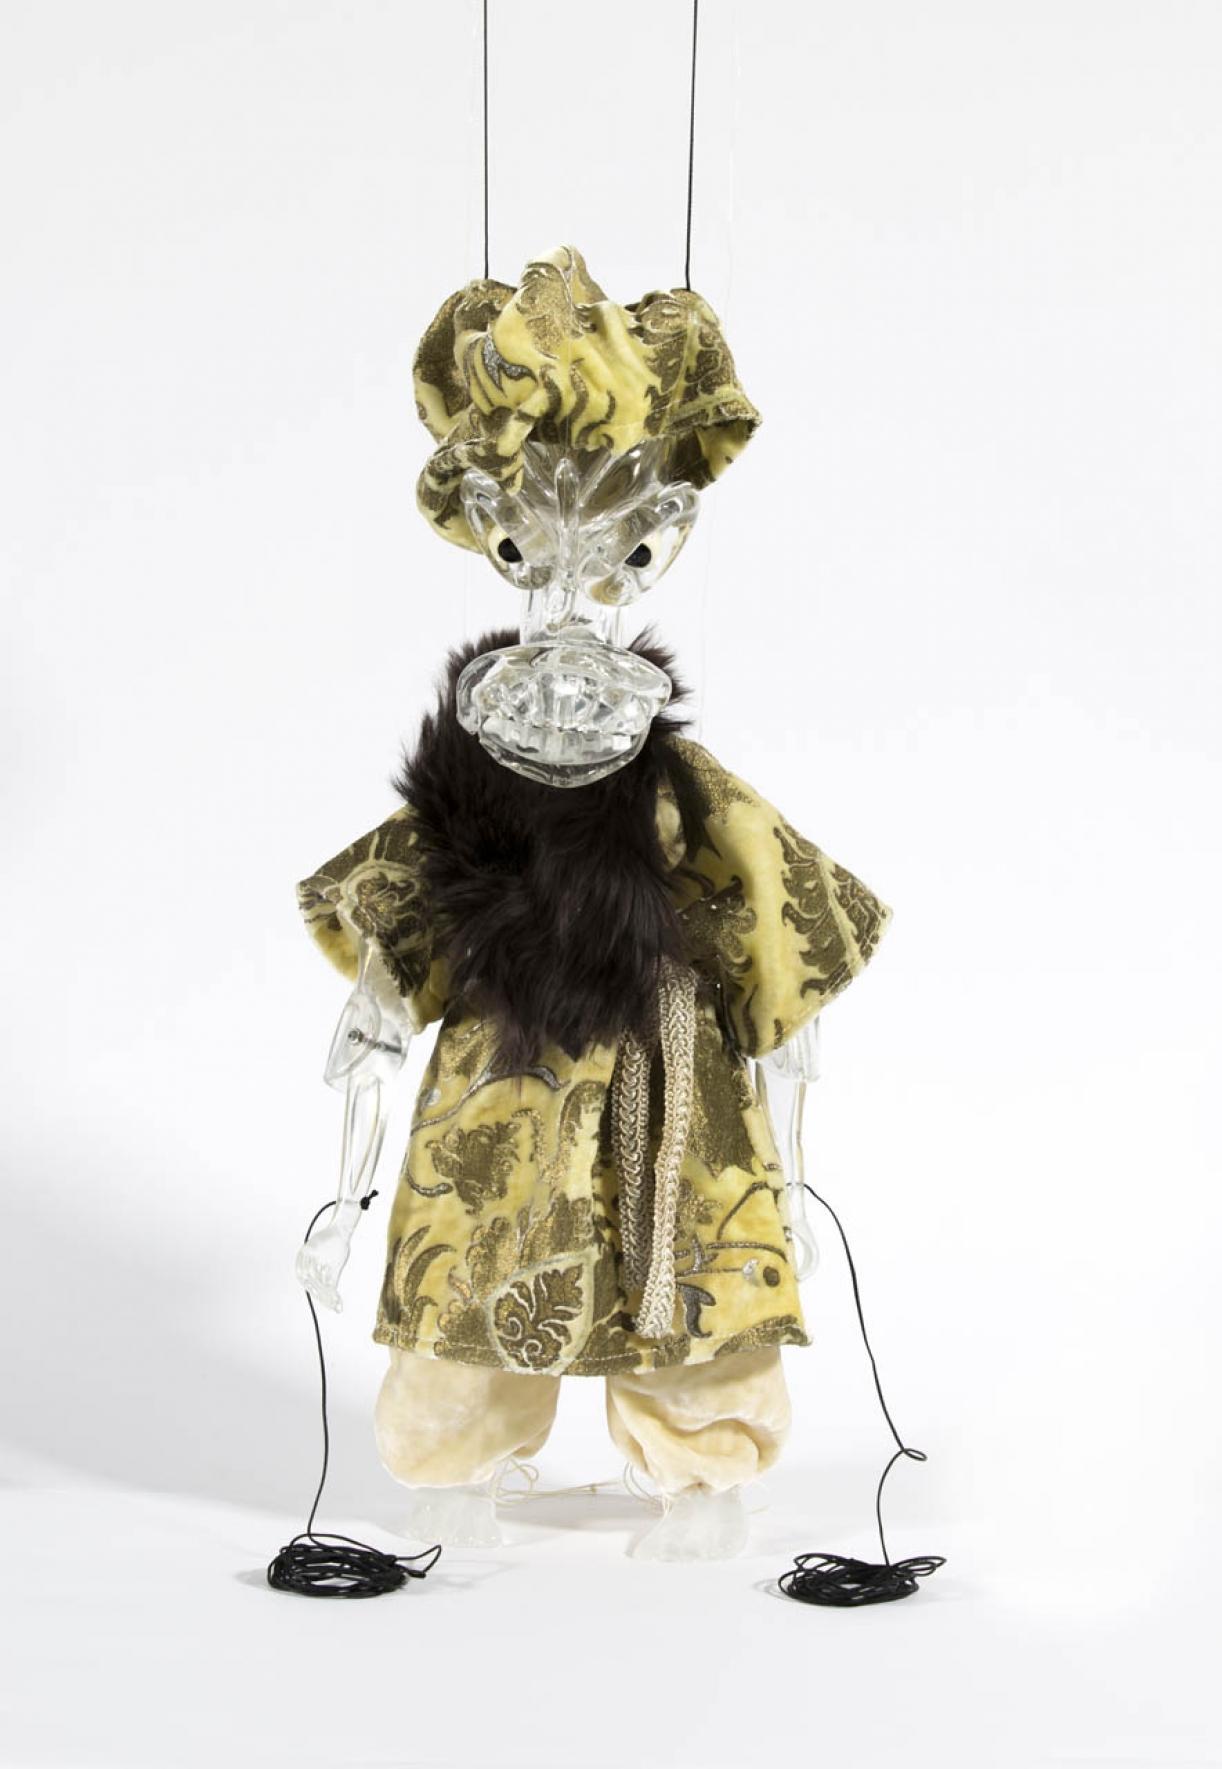 Cabaret Crusades: The Secrets of Karbalaa, Marionette (Semi static Turban 1 of Rashid al-Din Sinan's envoys), Glass, fabric, enamel, thread, 43 x 15 x 12 cm